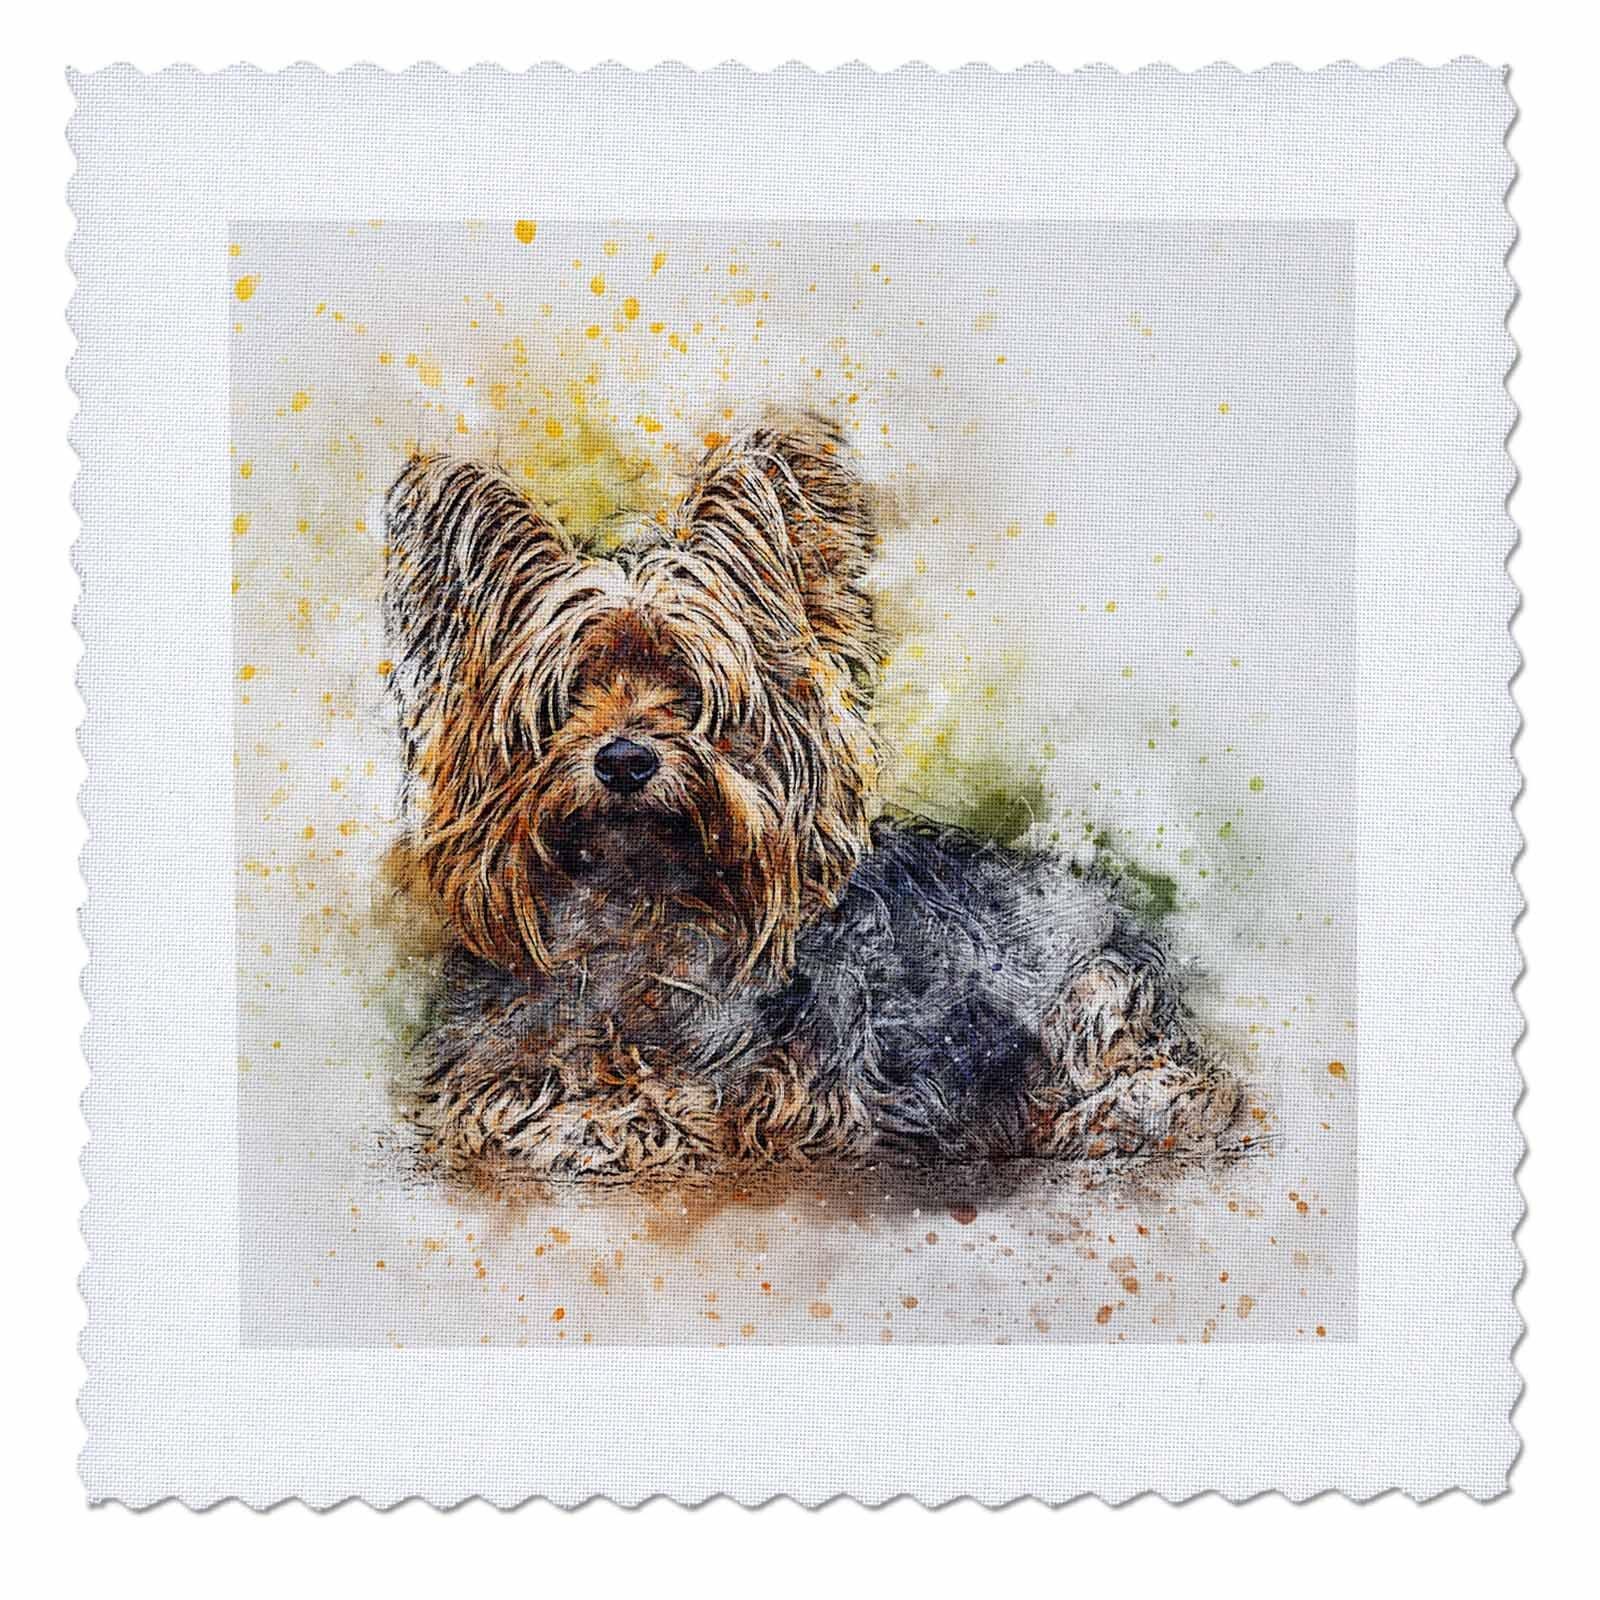 3dRose Sven Herkenrath Animal - Watercolor Dog Portrait - 22x22 inch quilt square (qs_280291_9)